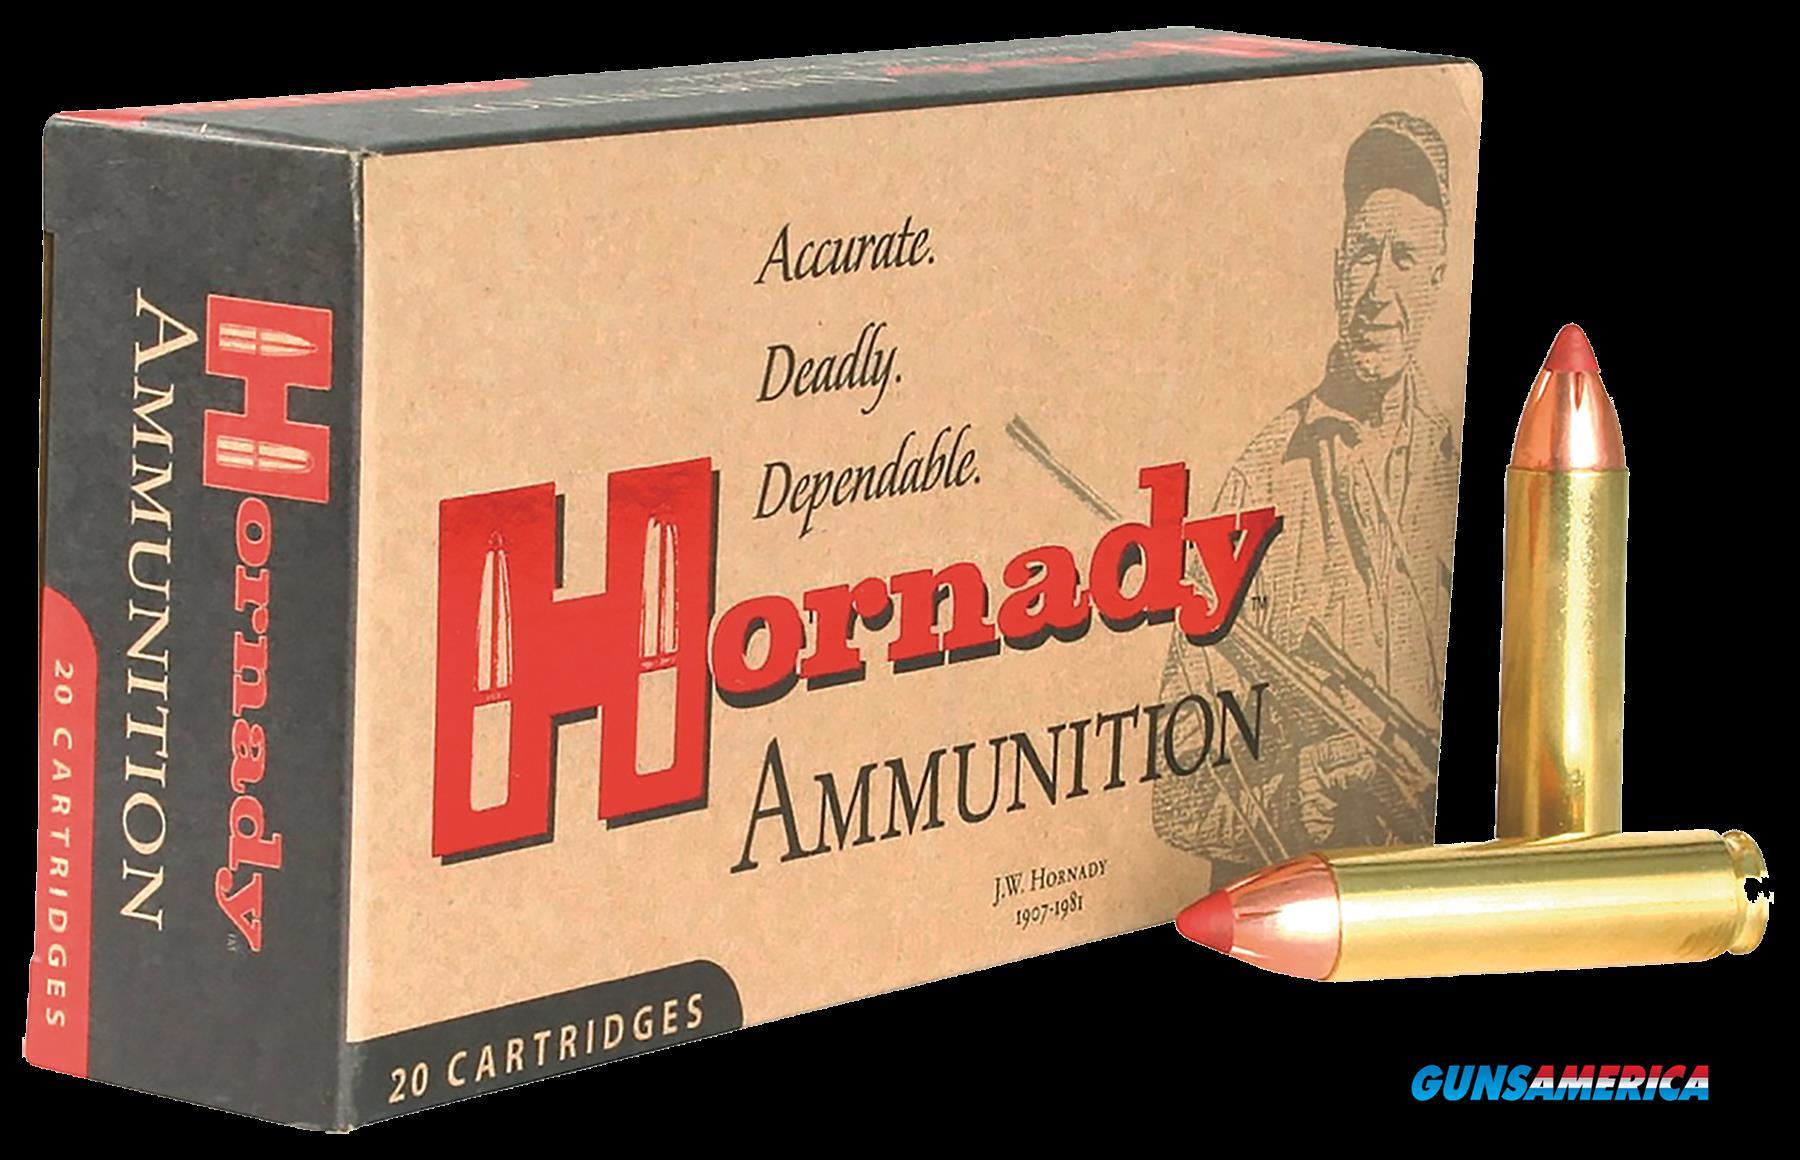 Hornady Custom, Horn 82244       450bsh 250 Ftx  20-10  Guns > Pistols > 1911 Pistol Copies (non-Colt)